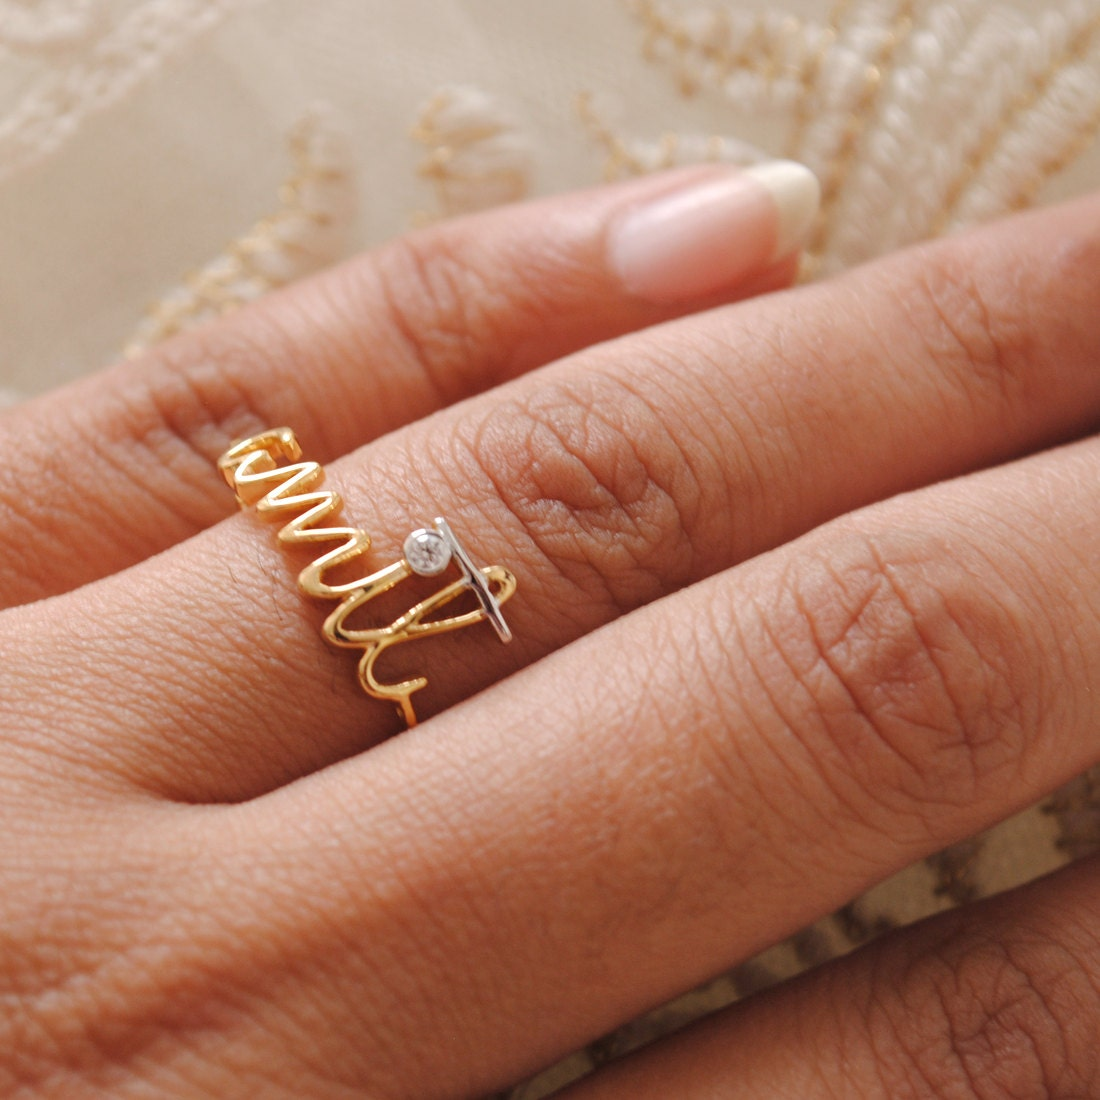 Custom Name 14k Yellow Gold Engagement Ring Gold & By. Interesting Engagement Rings. Ayala Wedding Rings. Claw Rings. Rose Cut Rings. State Rings. Cholesterol Rings. Vintage Bridal Set Wedding Engagement Rings. Geometric Rings